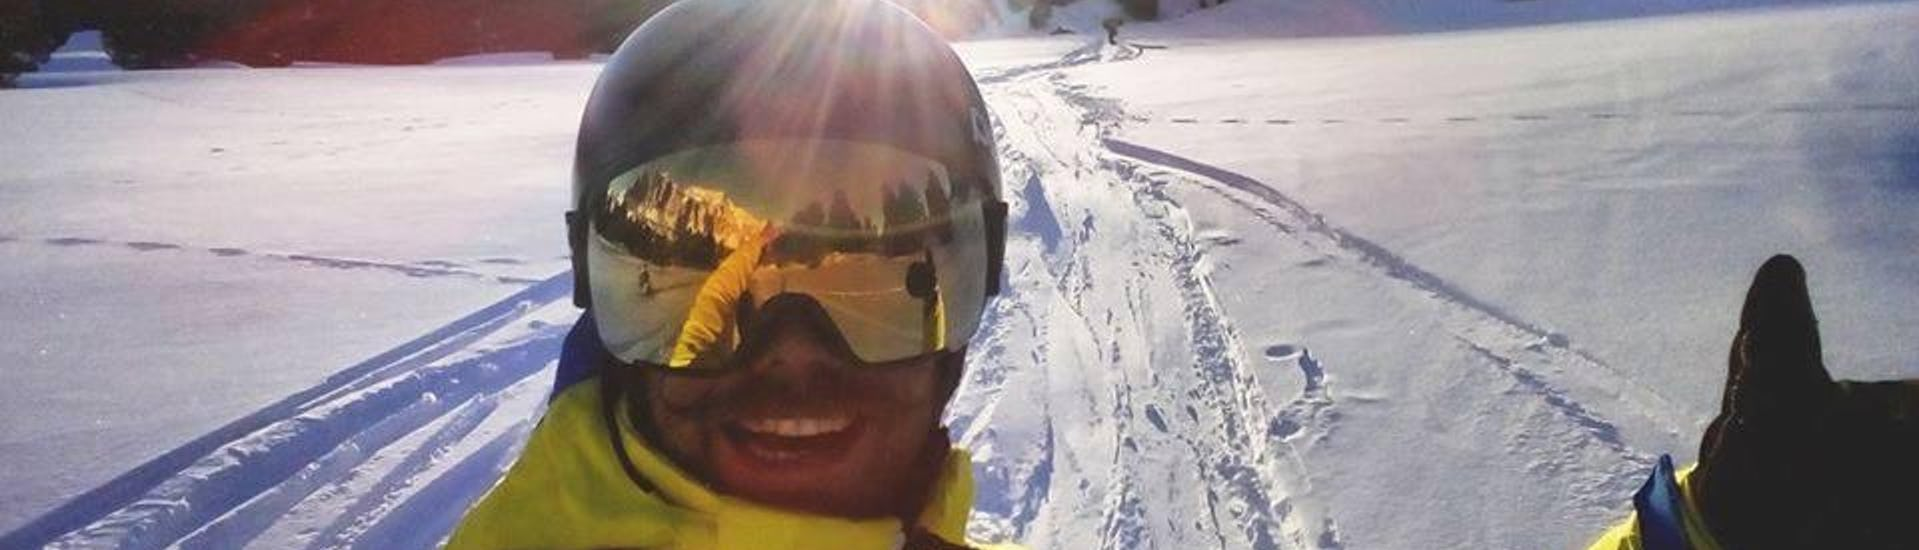 A boy snowboarding on the slopes of Val Gardena